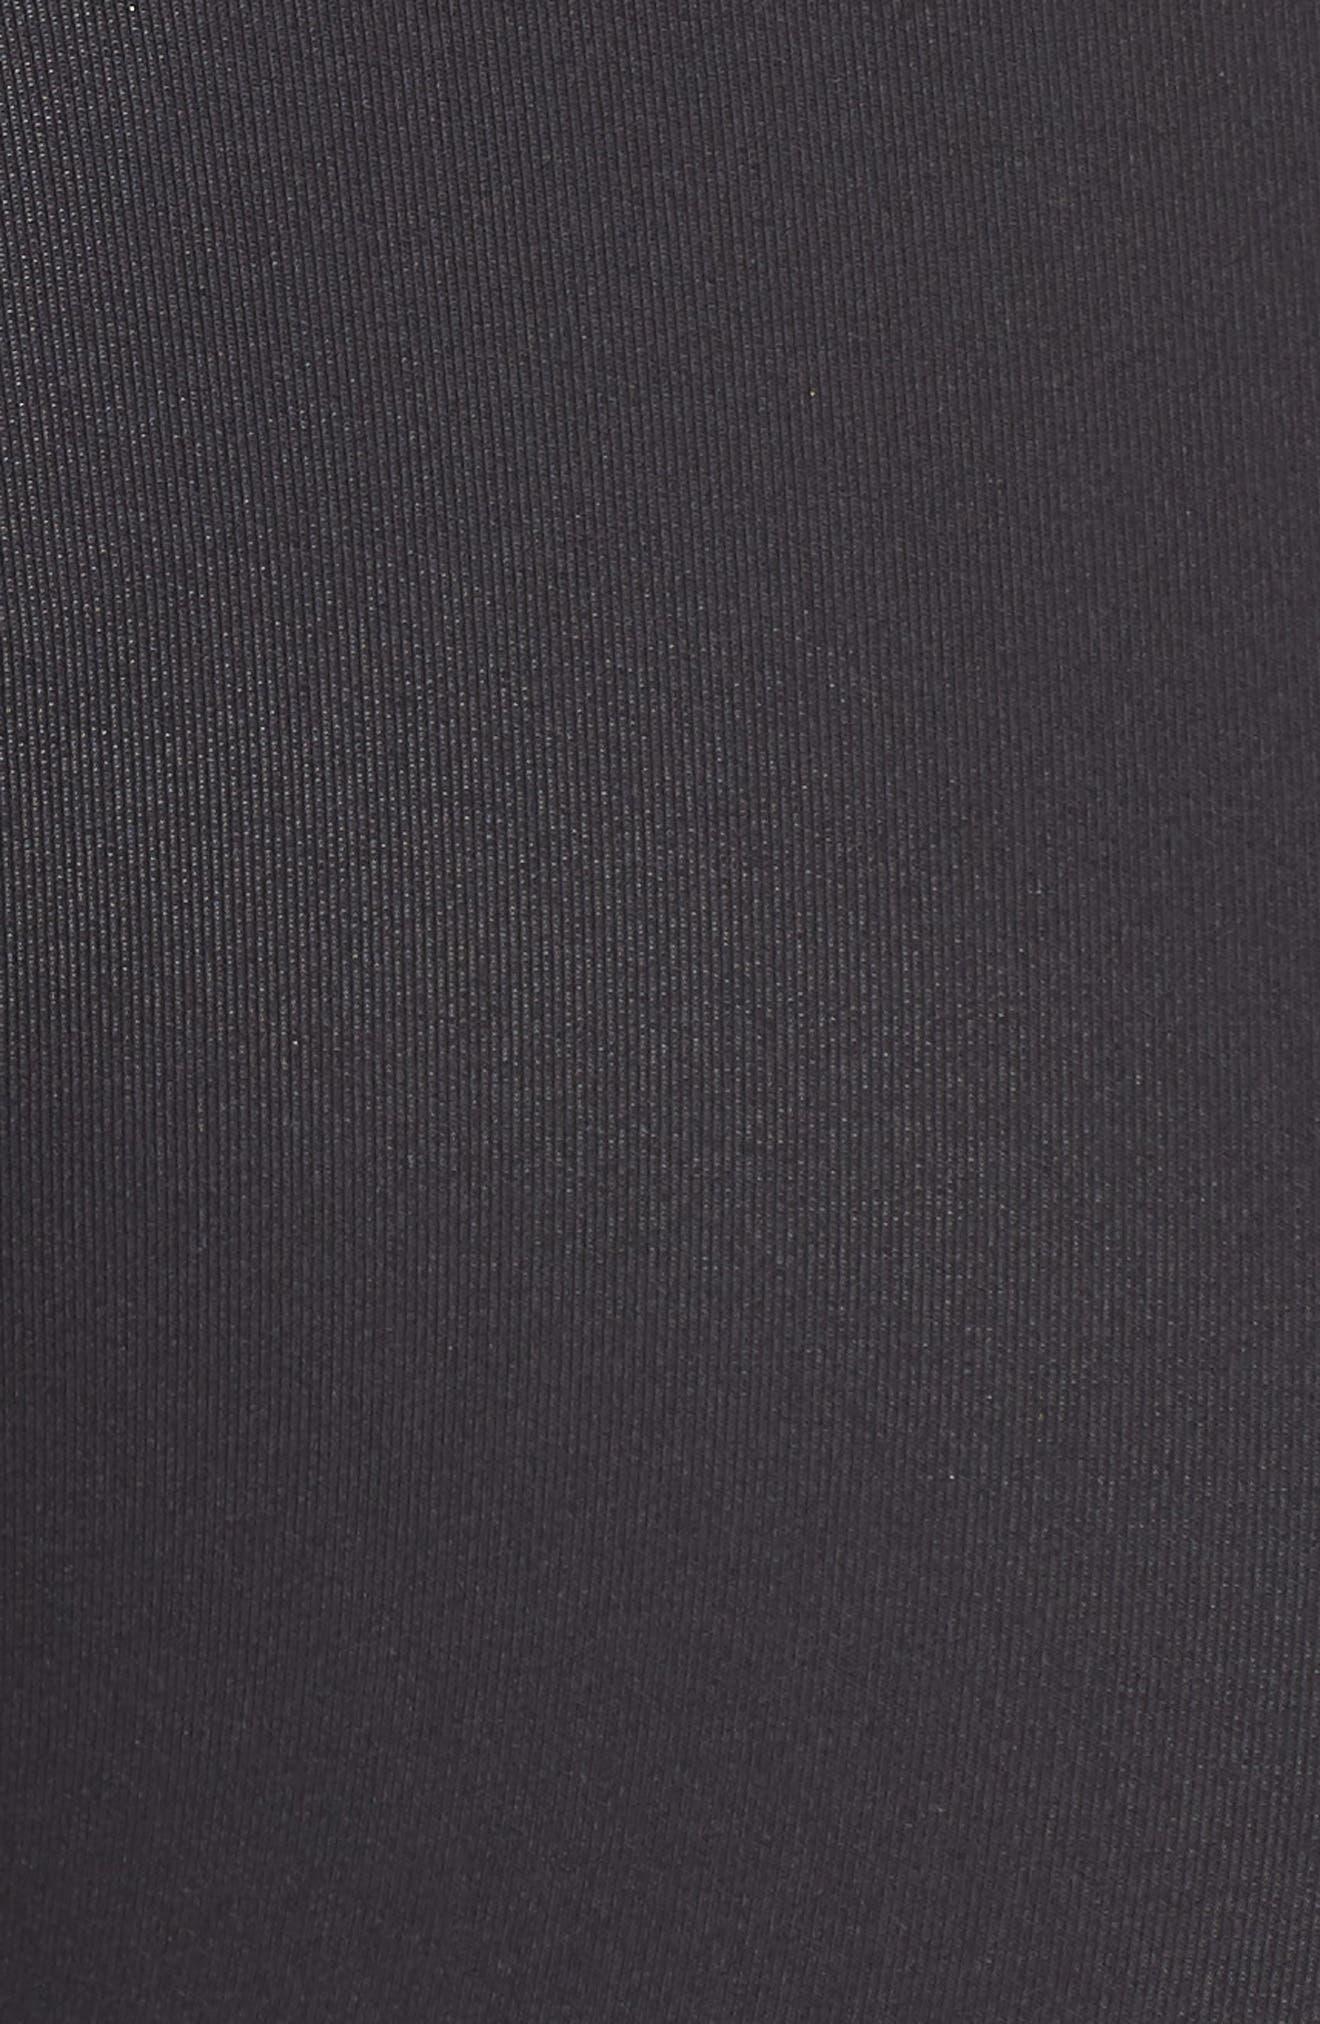 Take Leaf Longline Bralette,                             Alternate thumbnail 3, color,                             Black